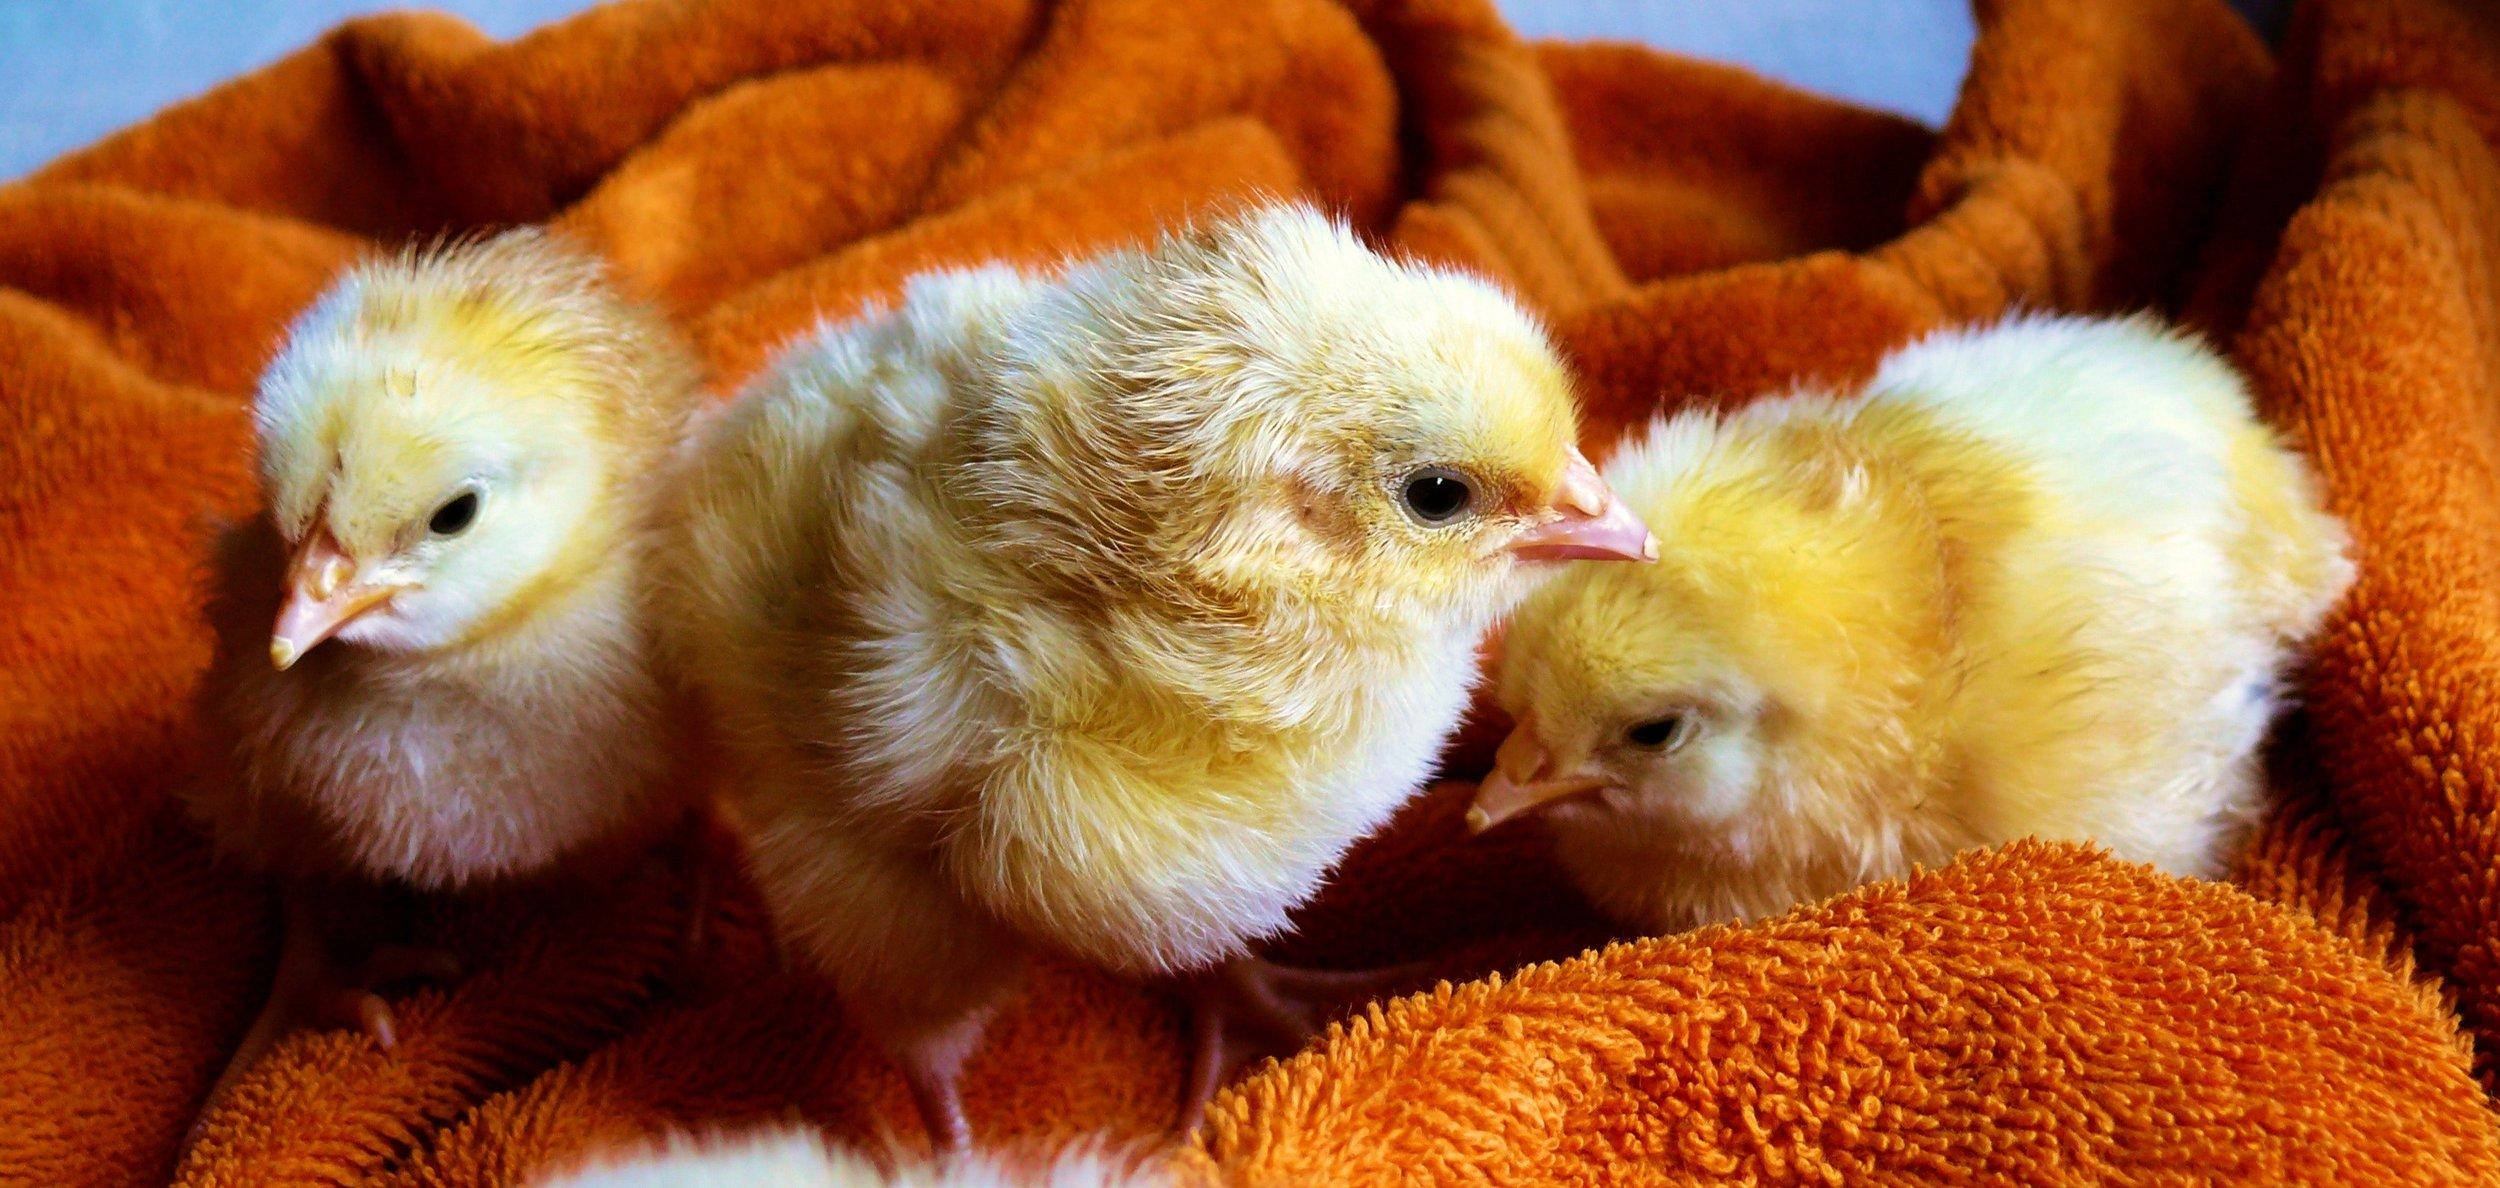 vegan-animal-rights.jpg